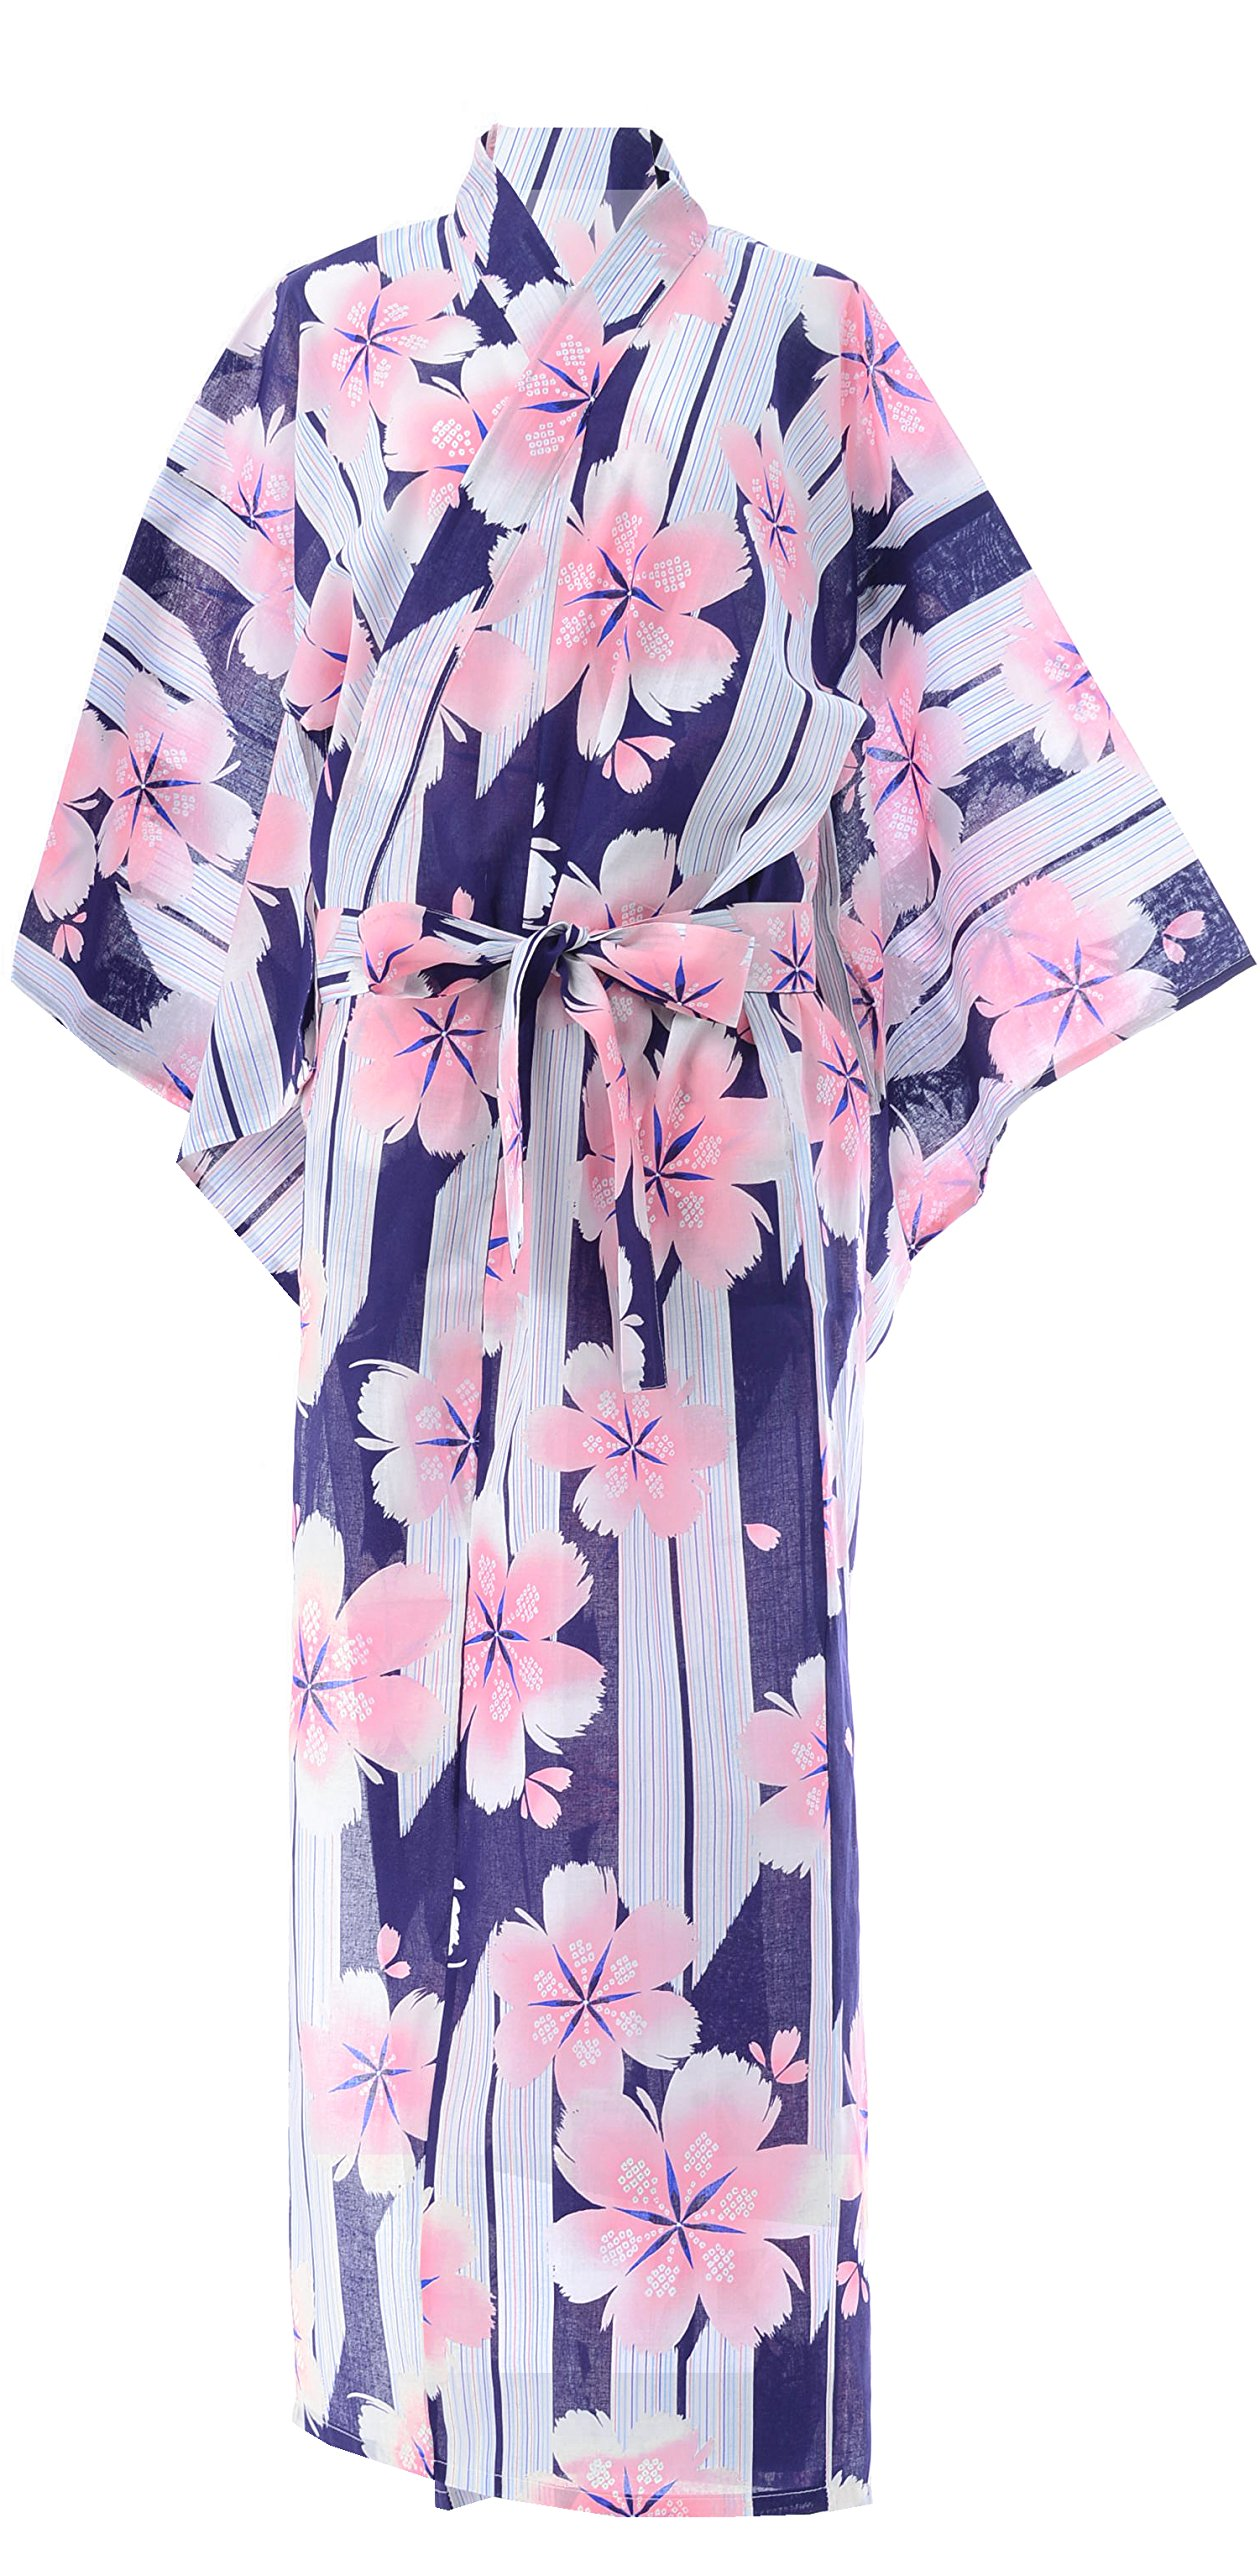 Kimura Jitsugyo Kyoto Traditional Easy Wear Yukata Robe (Japanese Casual Kimono Pajama) Japanese Cherry Blossoms Set 2 Large Woman